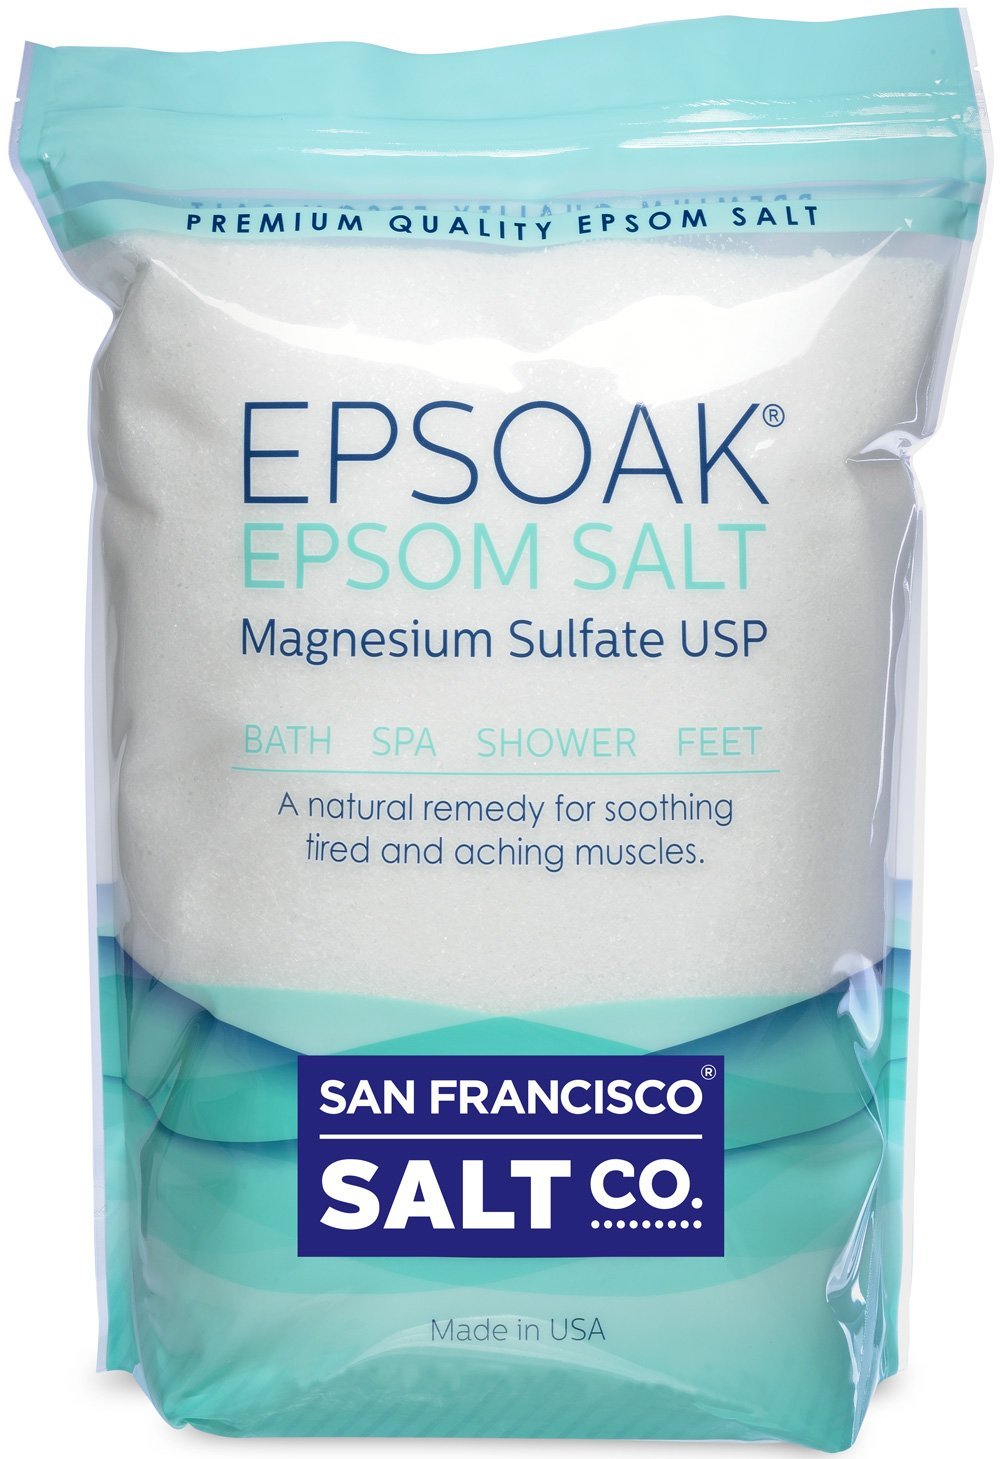 Epsoak Epsom Salt 2 Lbs - 100% Pure Magnesium Sulfate, Made in USA